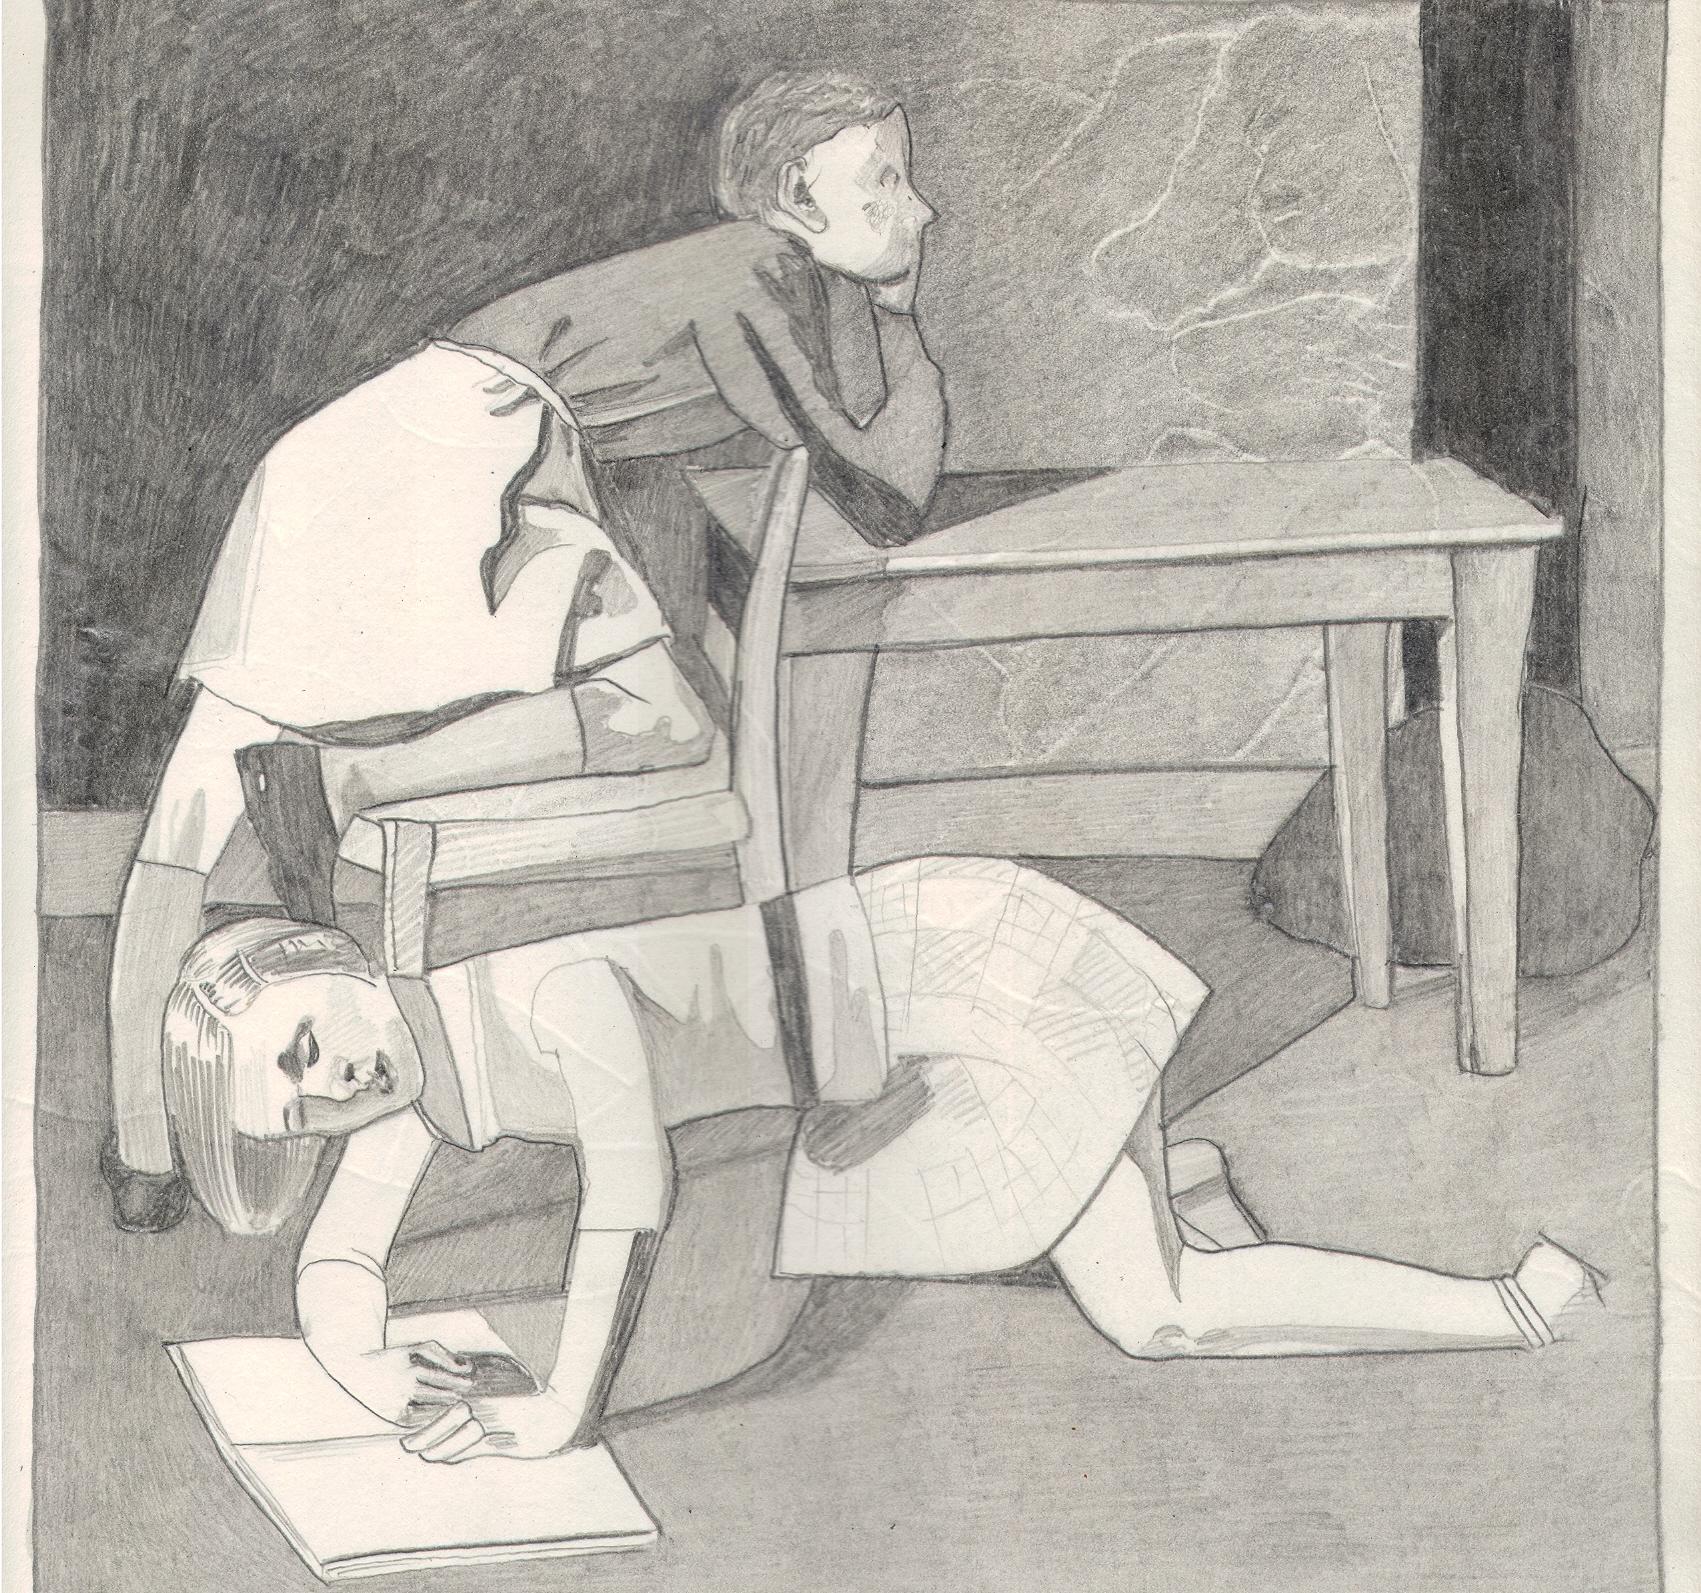 O.T. ( Serie Balthus 10 ), 2018  Bleistift auf Papier, 26x35.5cm